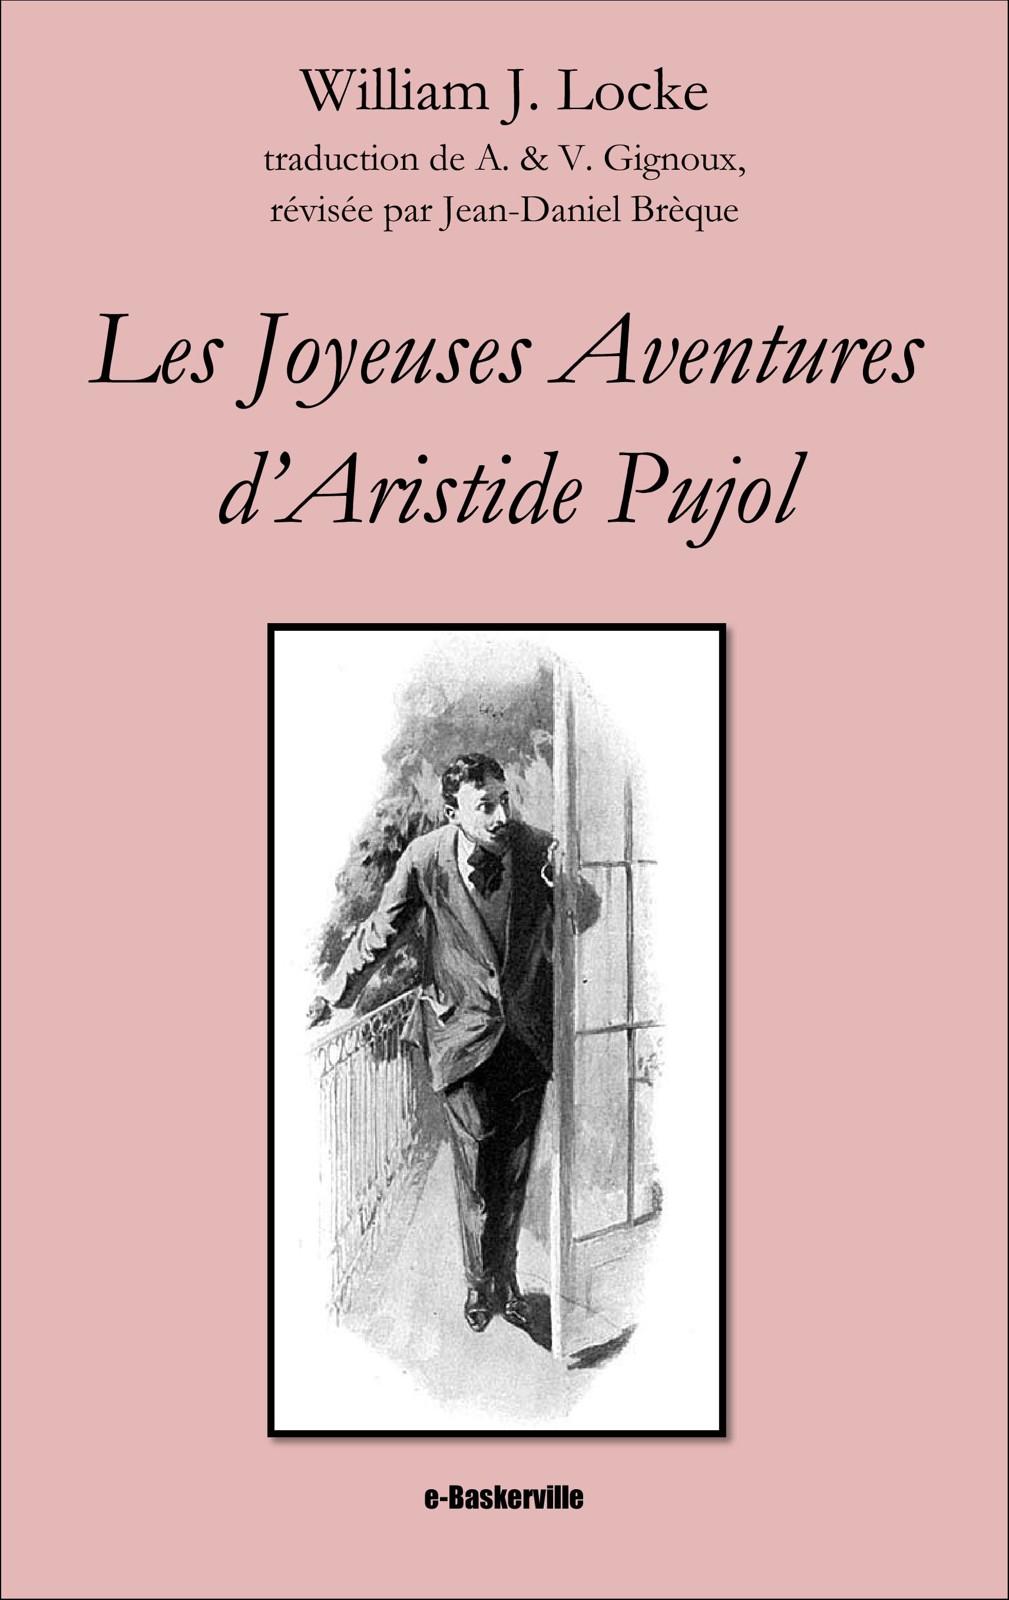 Les Joyeuses Aventures d'Aristide Pujol